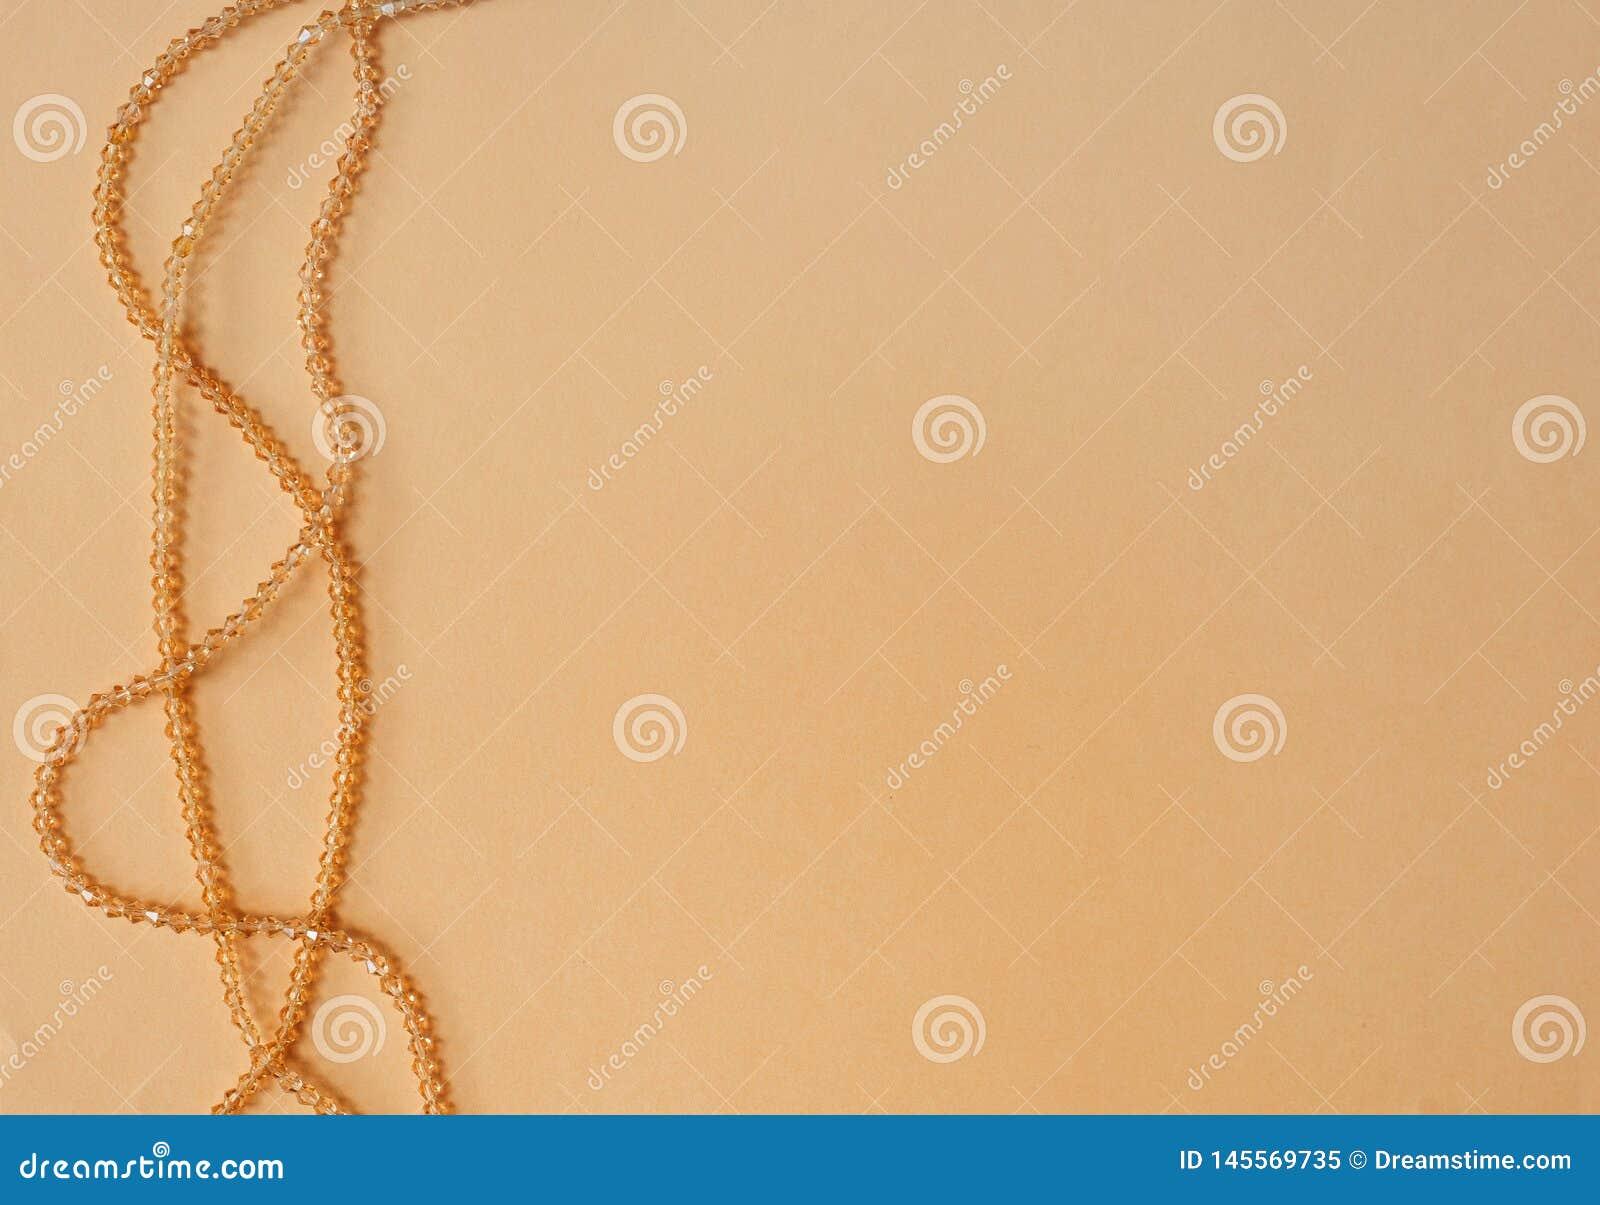 Handgjord Wood kragehalsband p? en kul?r bakgrund